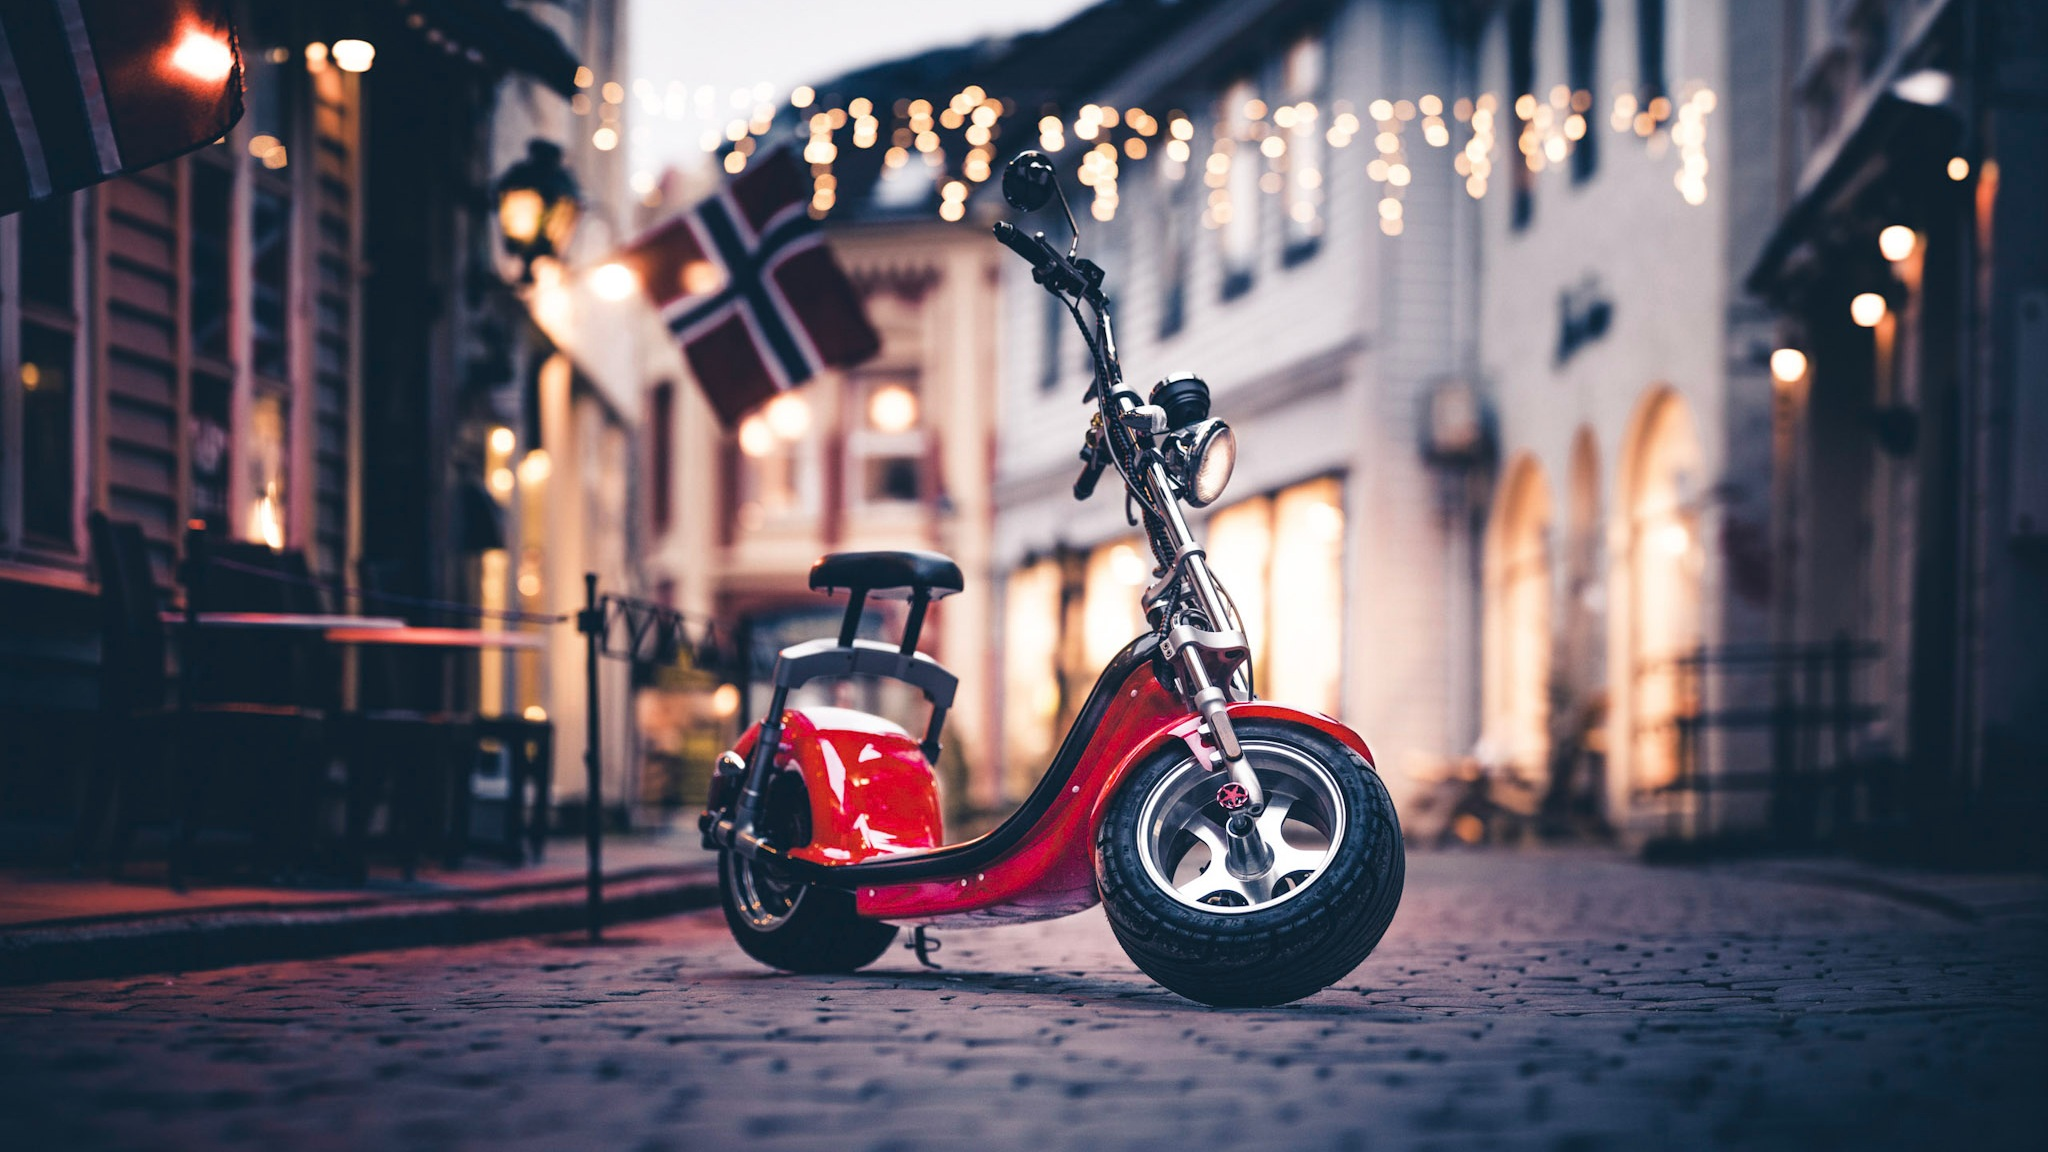 thunder-elektriosk-moped-aaland-bil.jpg